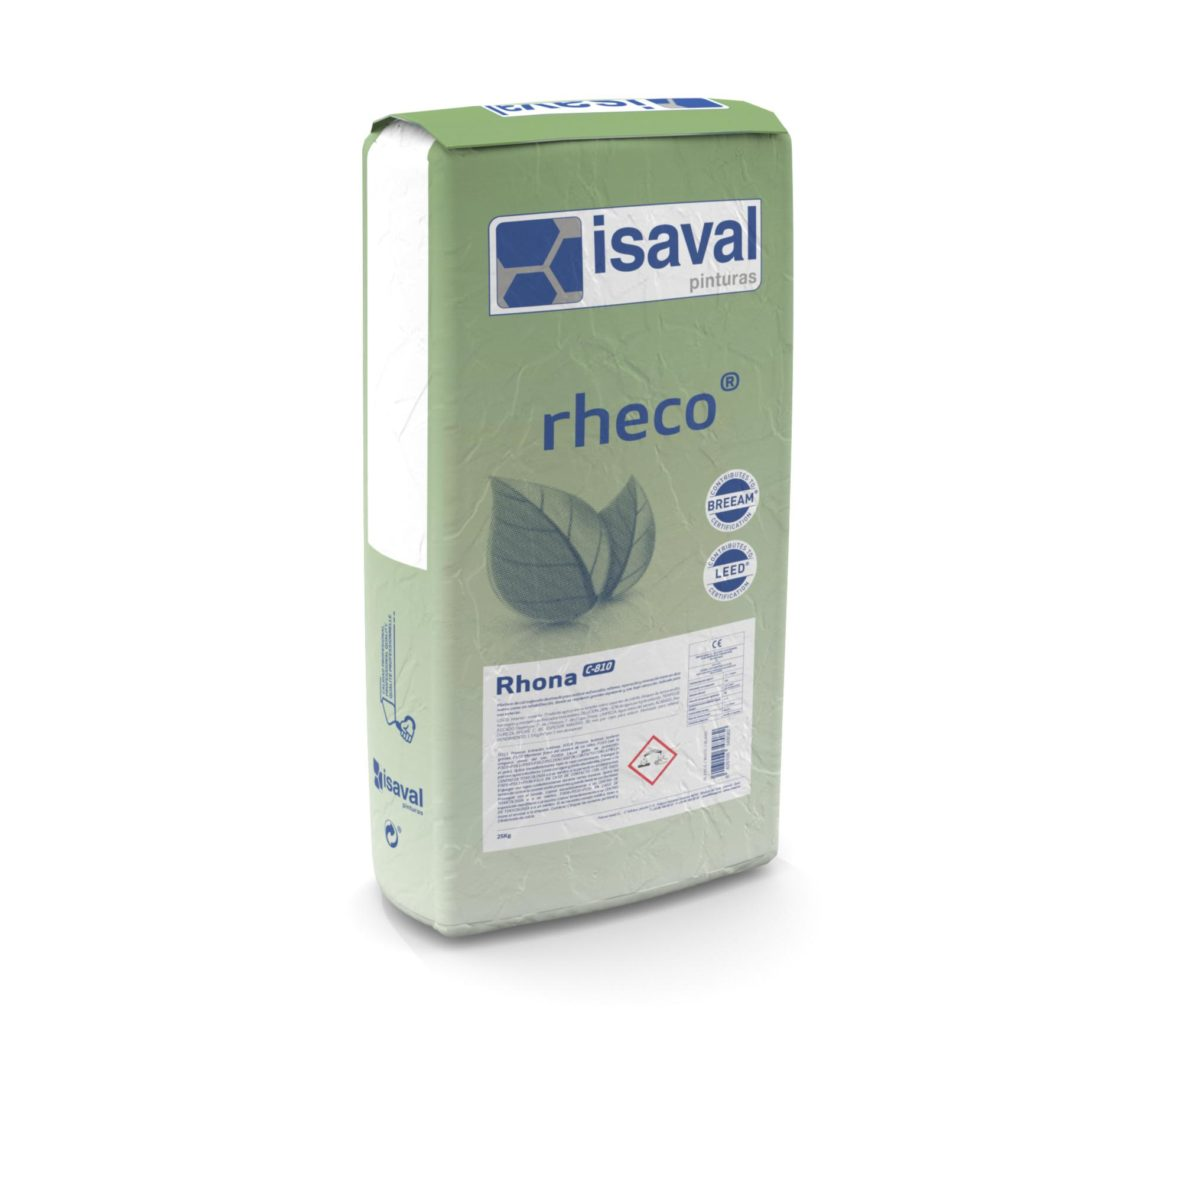 rhona C-810 rheco